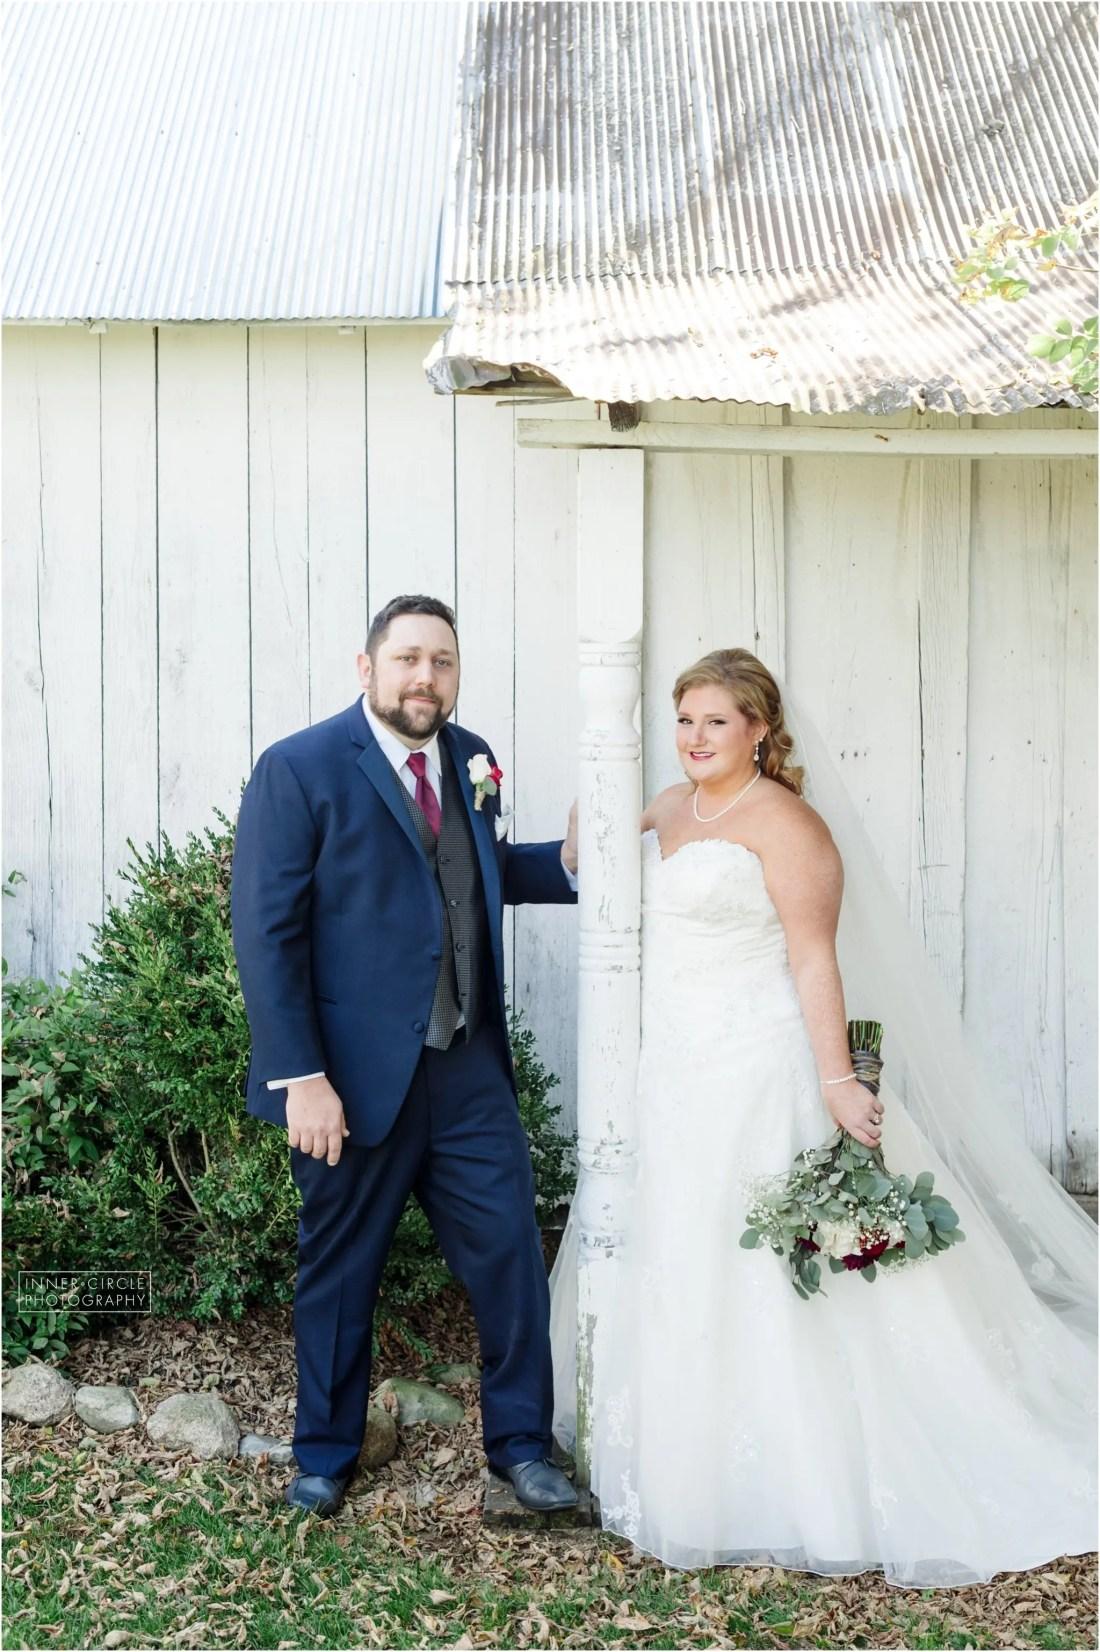 chrislauren_WED_InnerCirclePhoto_188 Chris + Lauren :: MARRIED!